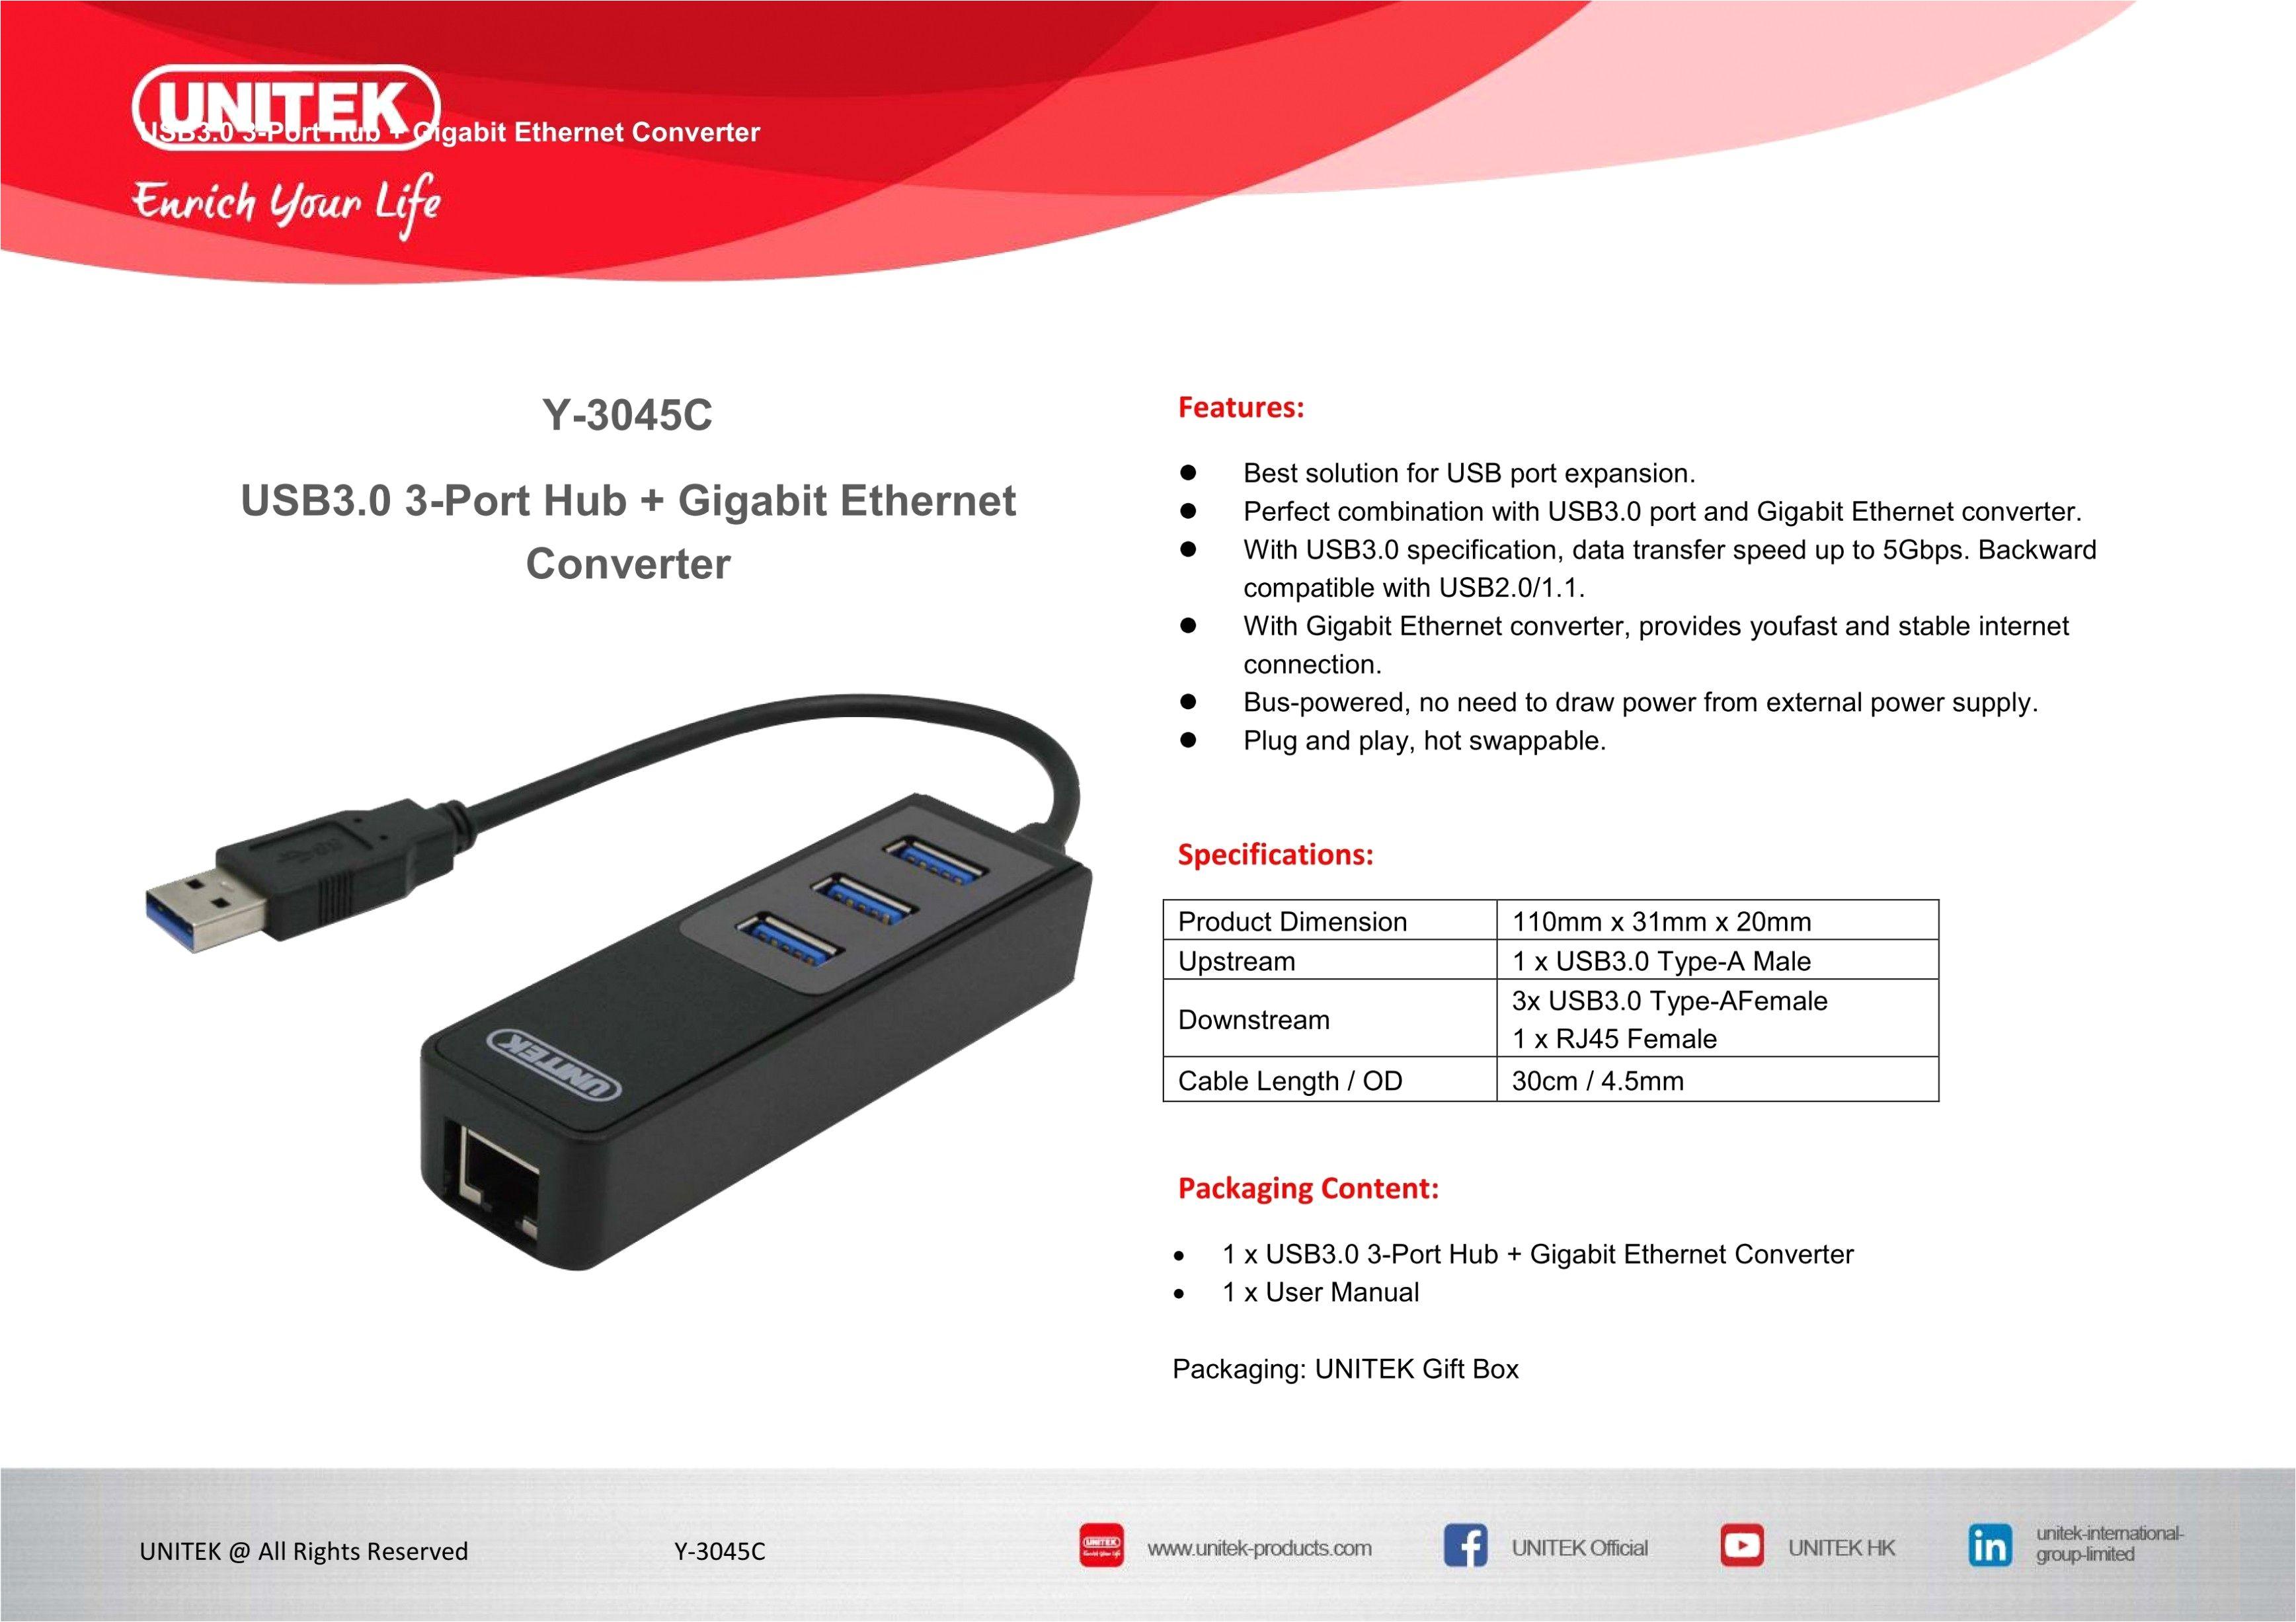 Usb 3.0 Cable Wiring Diagram 30807d1398733952humidifierwiringhelp700ahumidifierjpg Blog Wiring